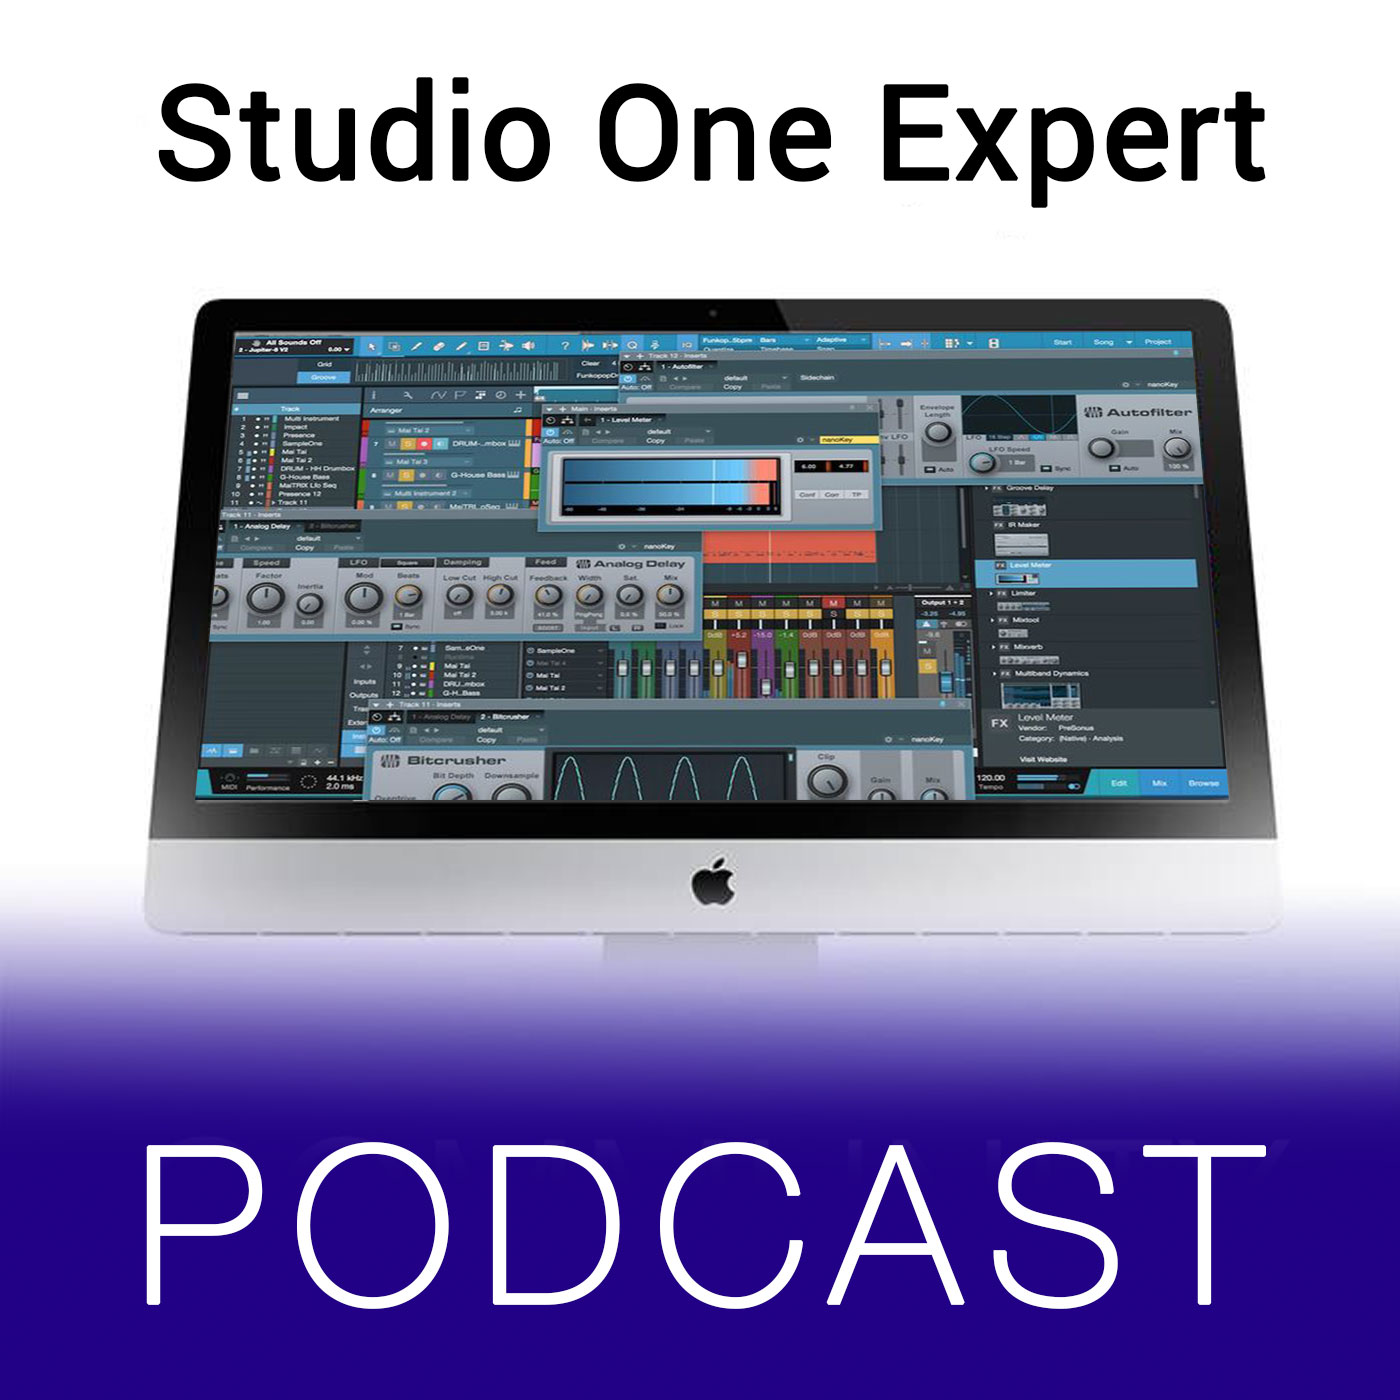 Studio One Expert Studio One Podcast